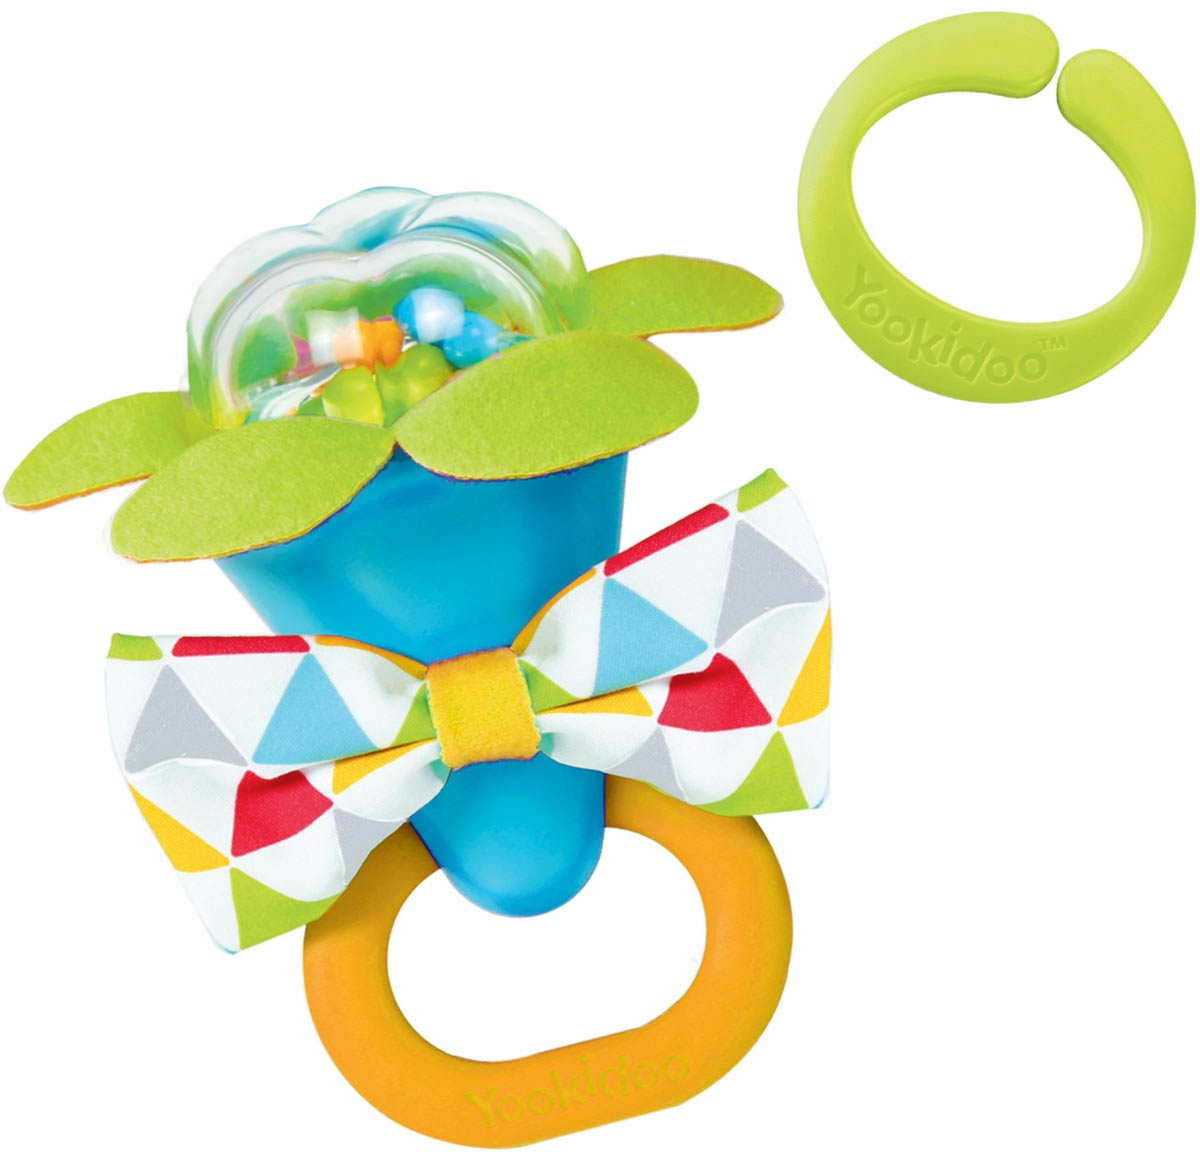 Yookidoo Моя первая погремушка цвет синий global marketing management page 9